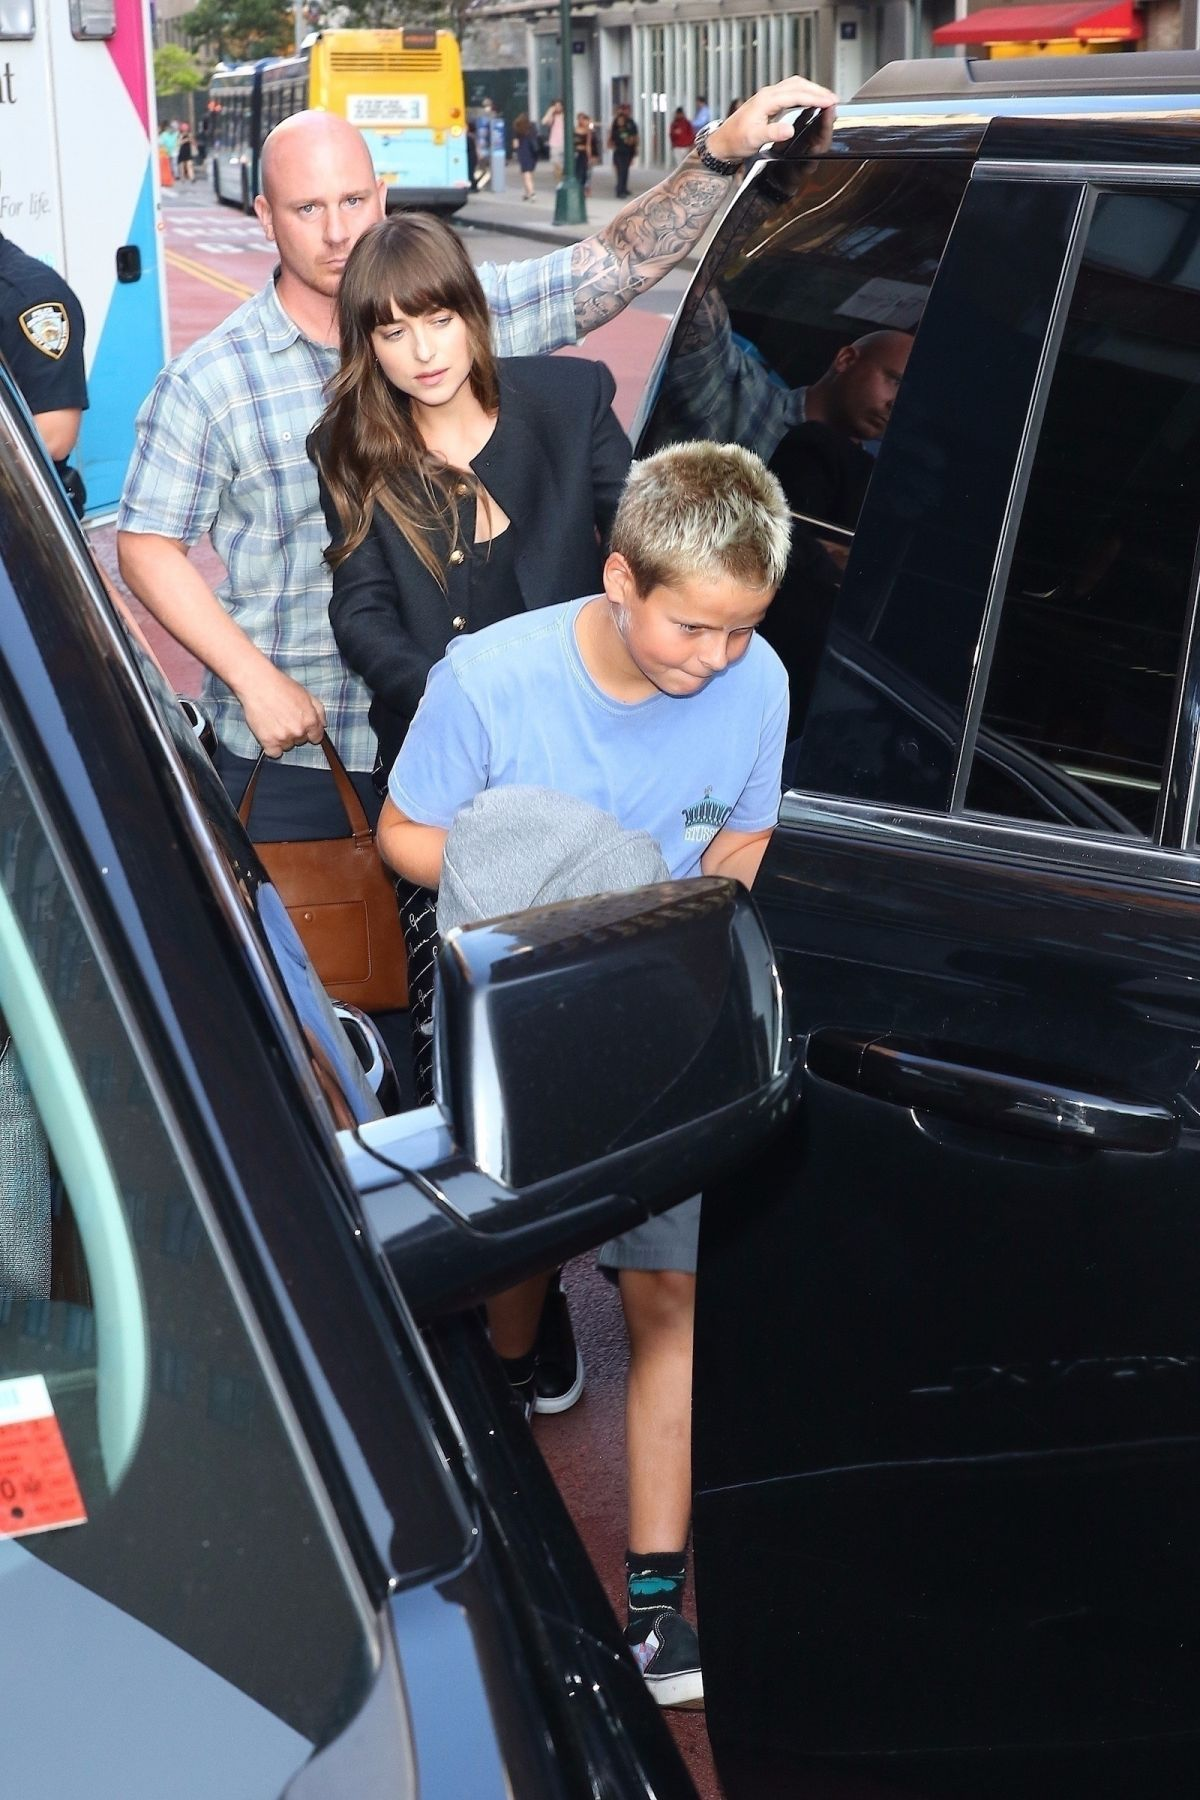 DAKOTA JOHNSON and Chris Martin Are Involved in a Car